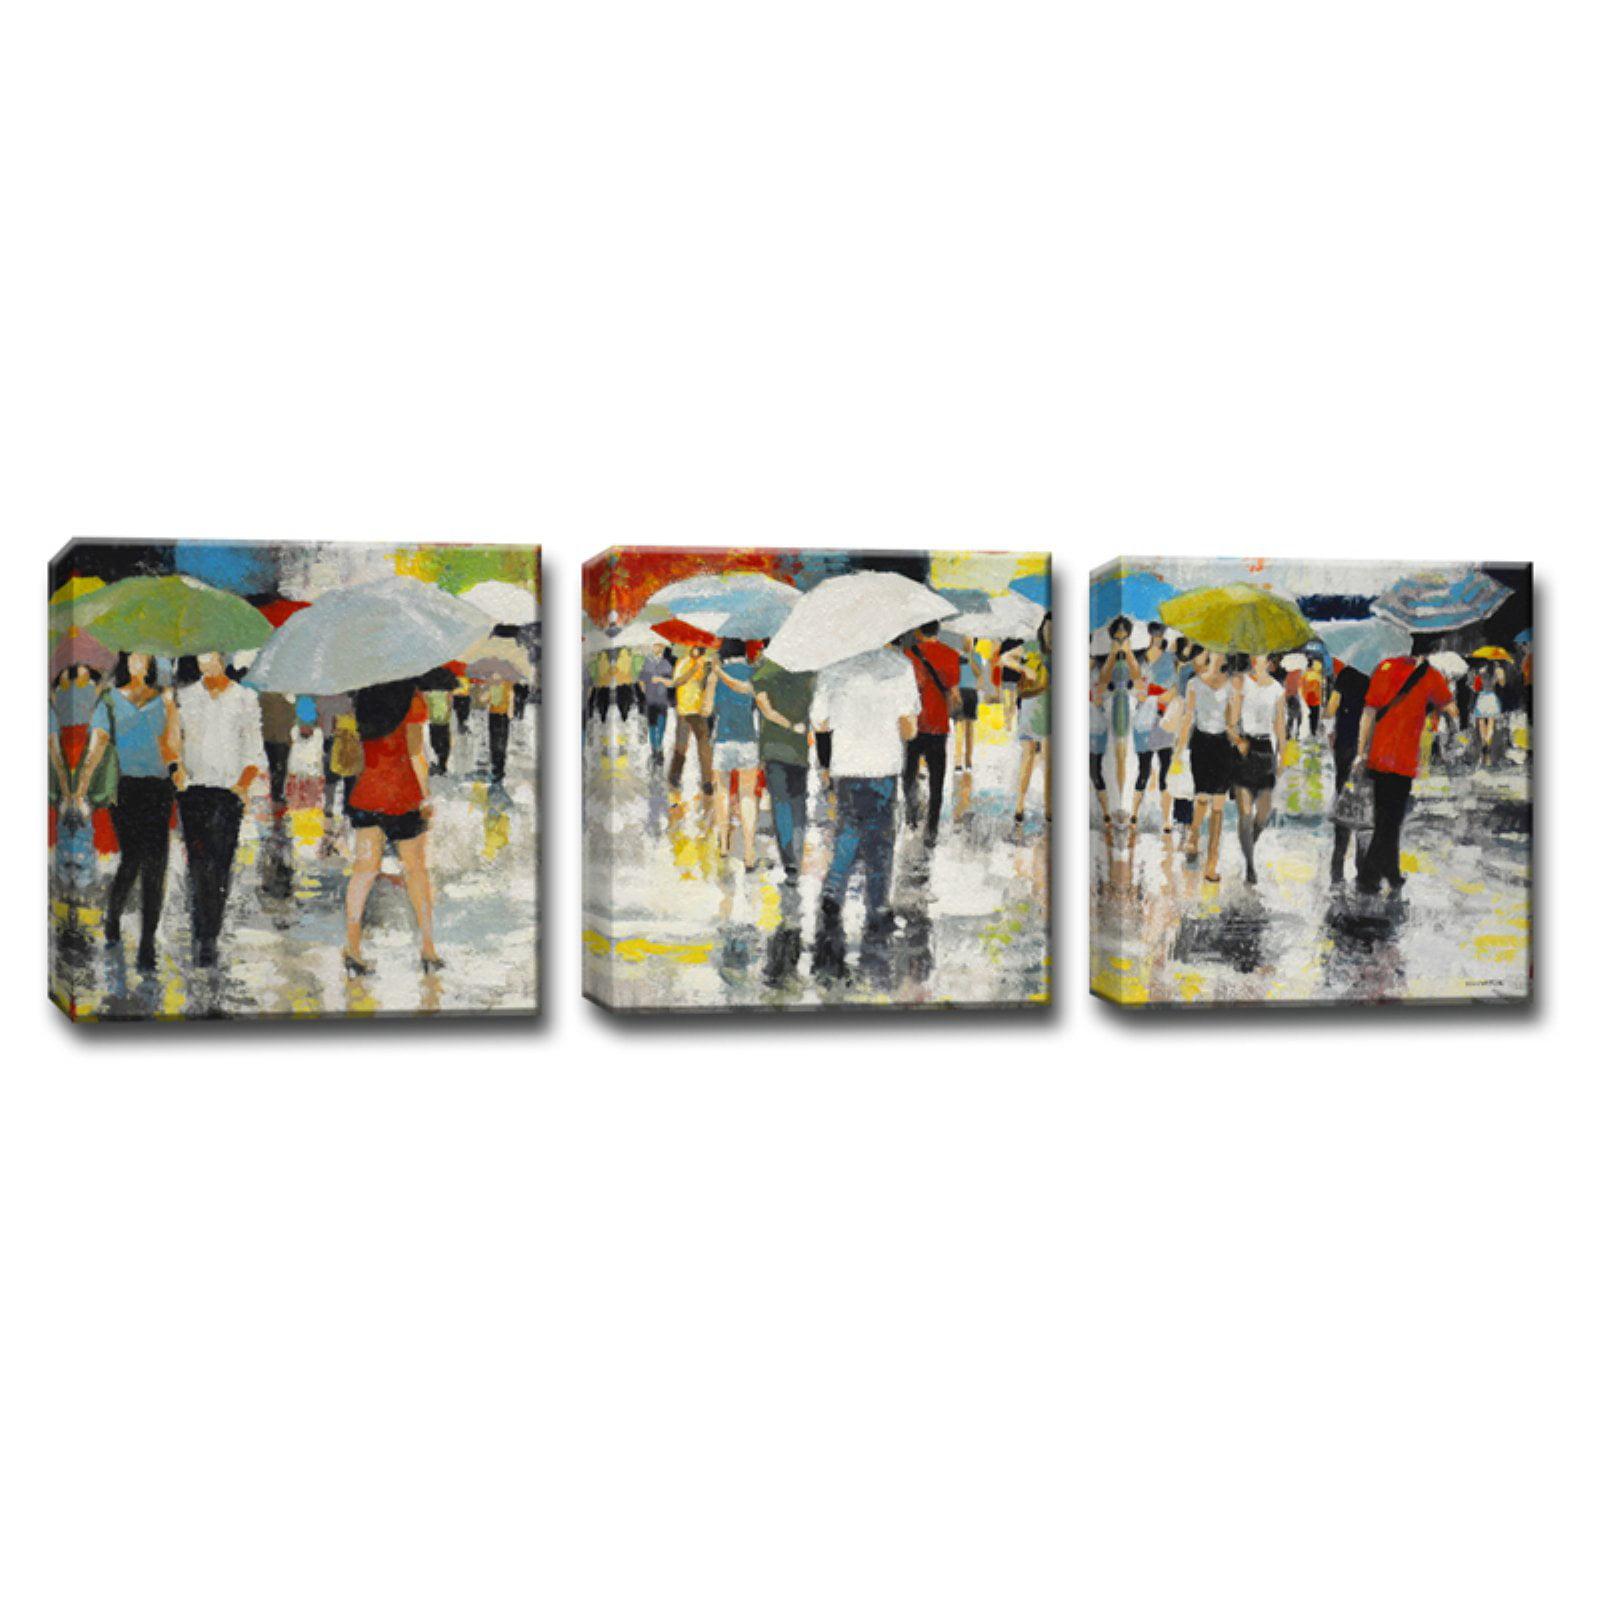 Ready2HangArt Umbrellas Wrapped Canvas Wall Art - 3 pc. Set